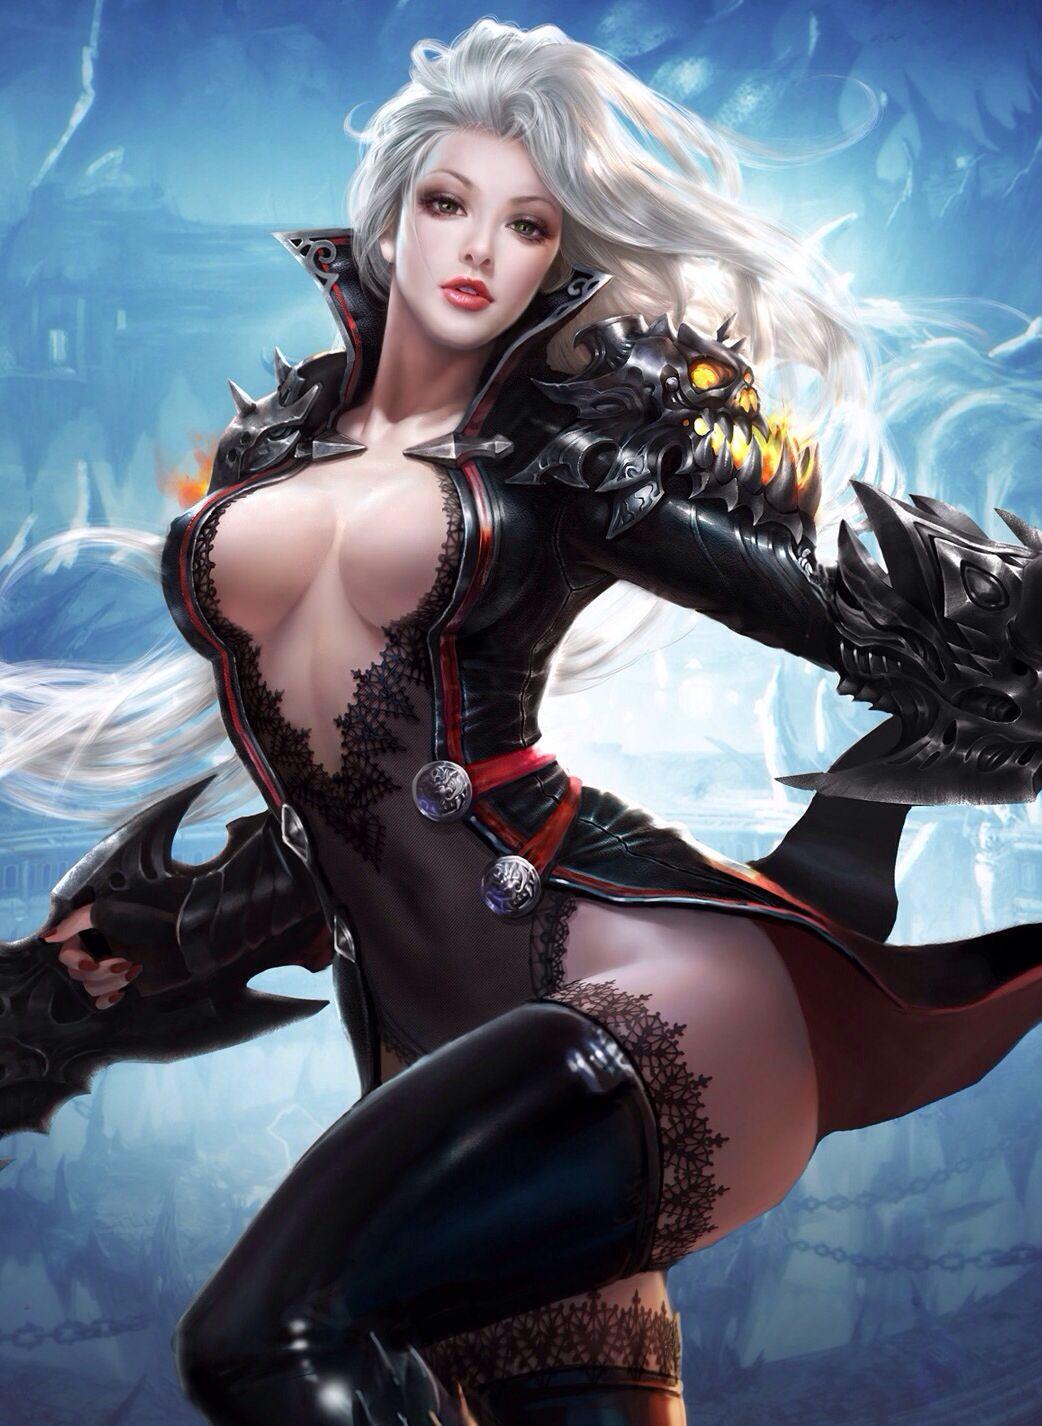 Seductive fantasy girl erotic pics